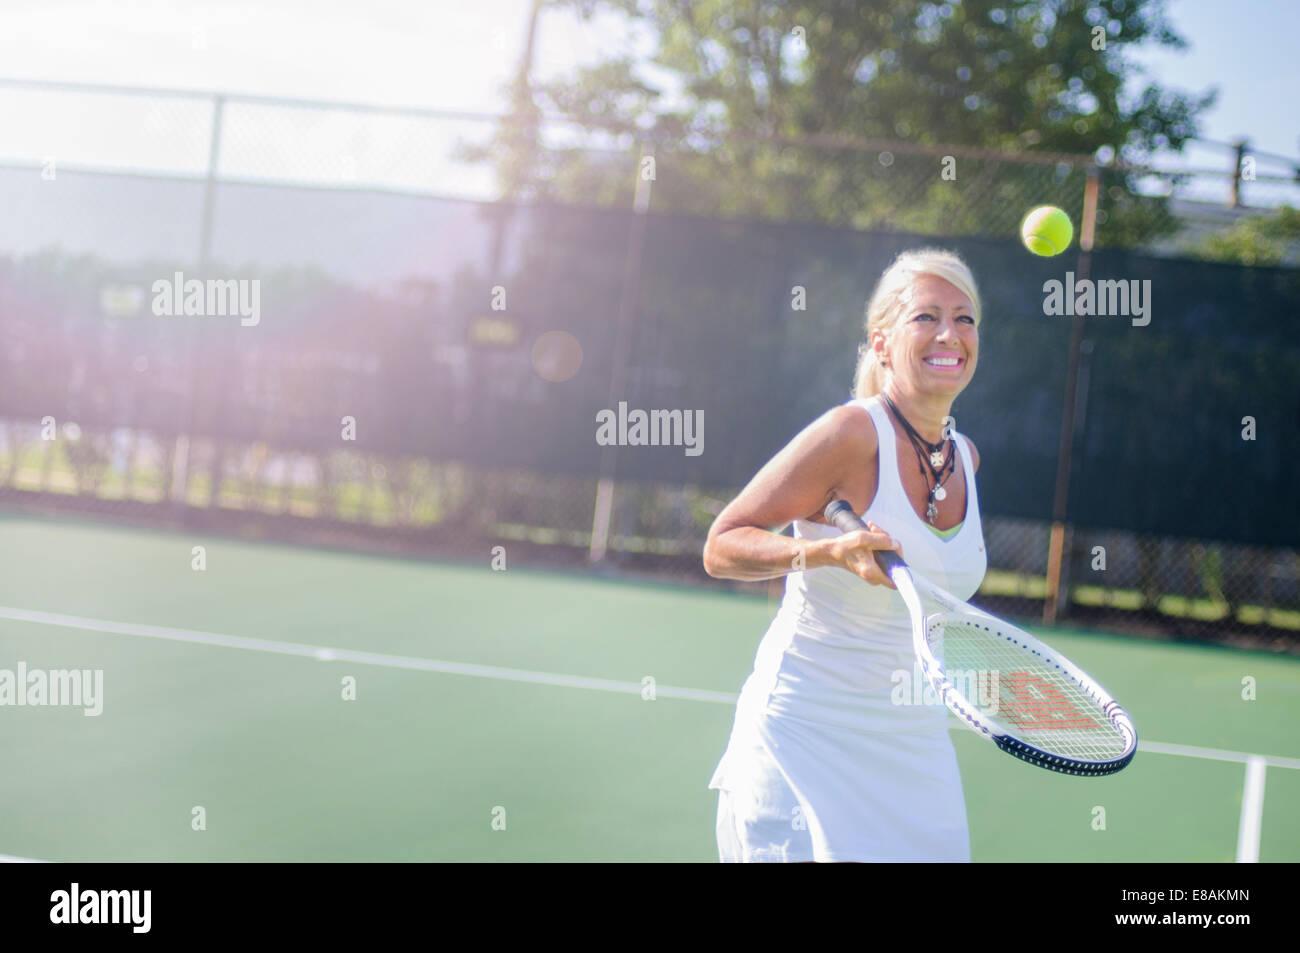 Smiling mature woman playing tennis - Stock Image